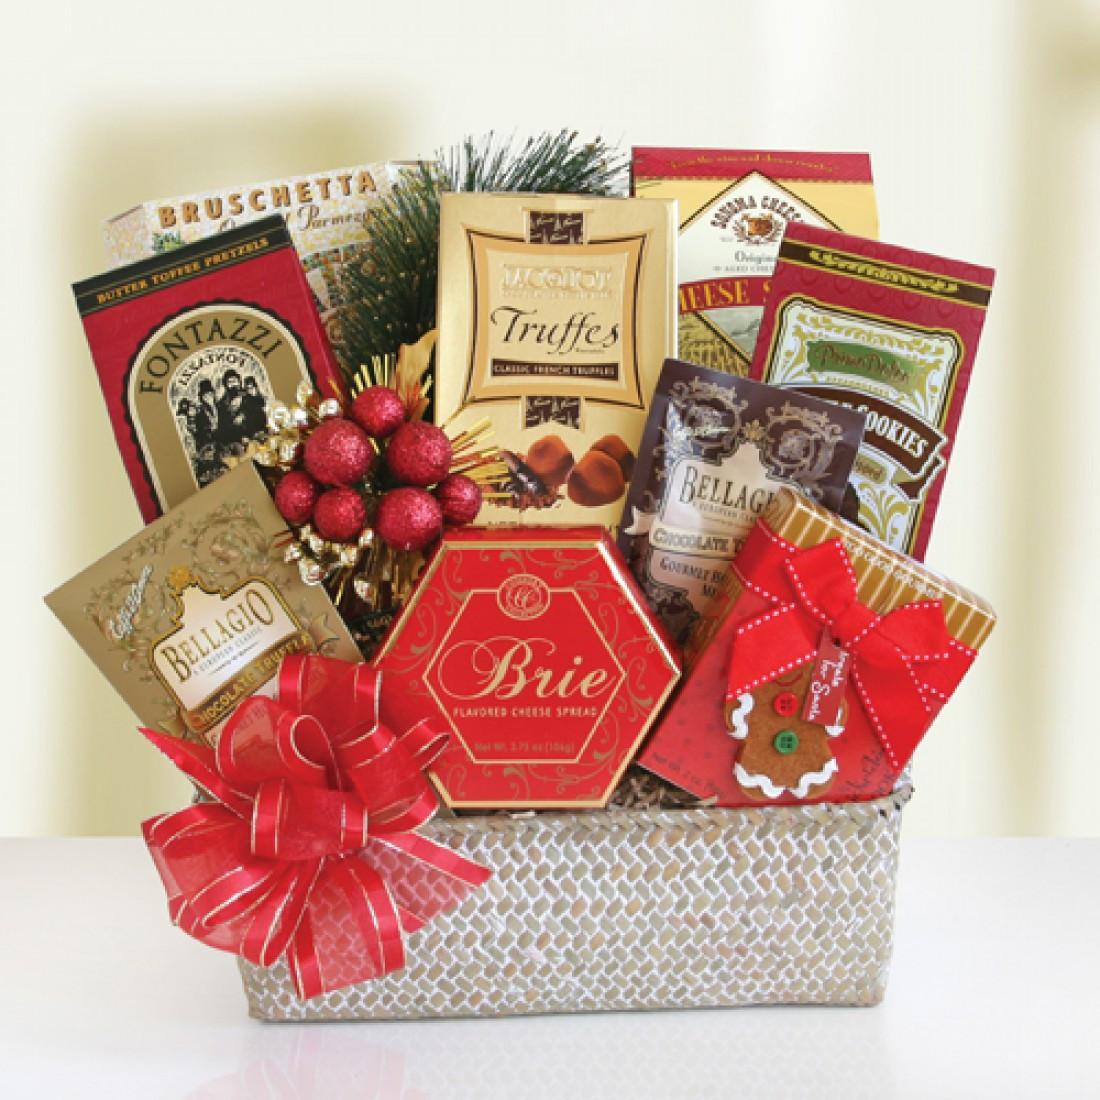 Christmas Food Gifts Baskets  Festive Holiday Food Baskets 7919 At Print EZ